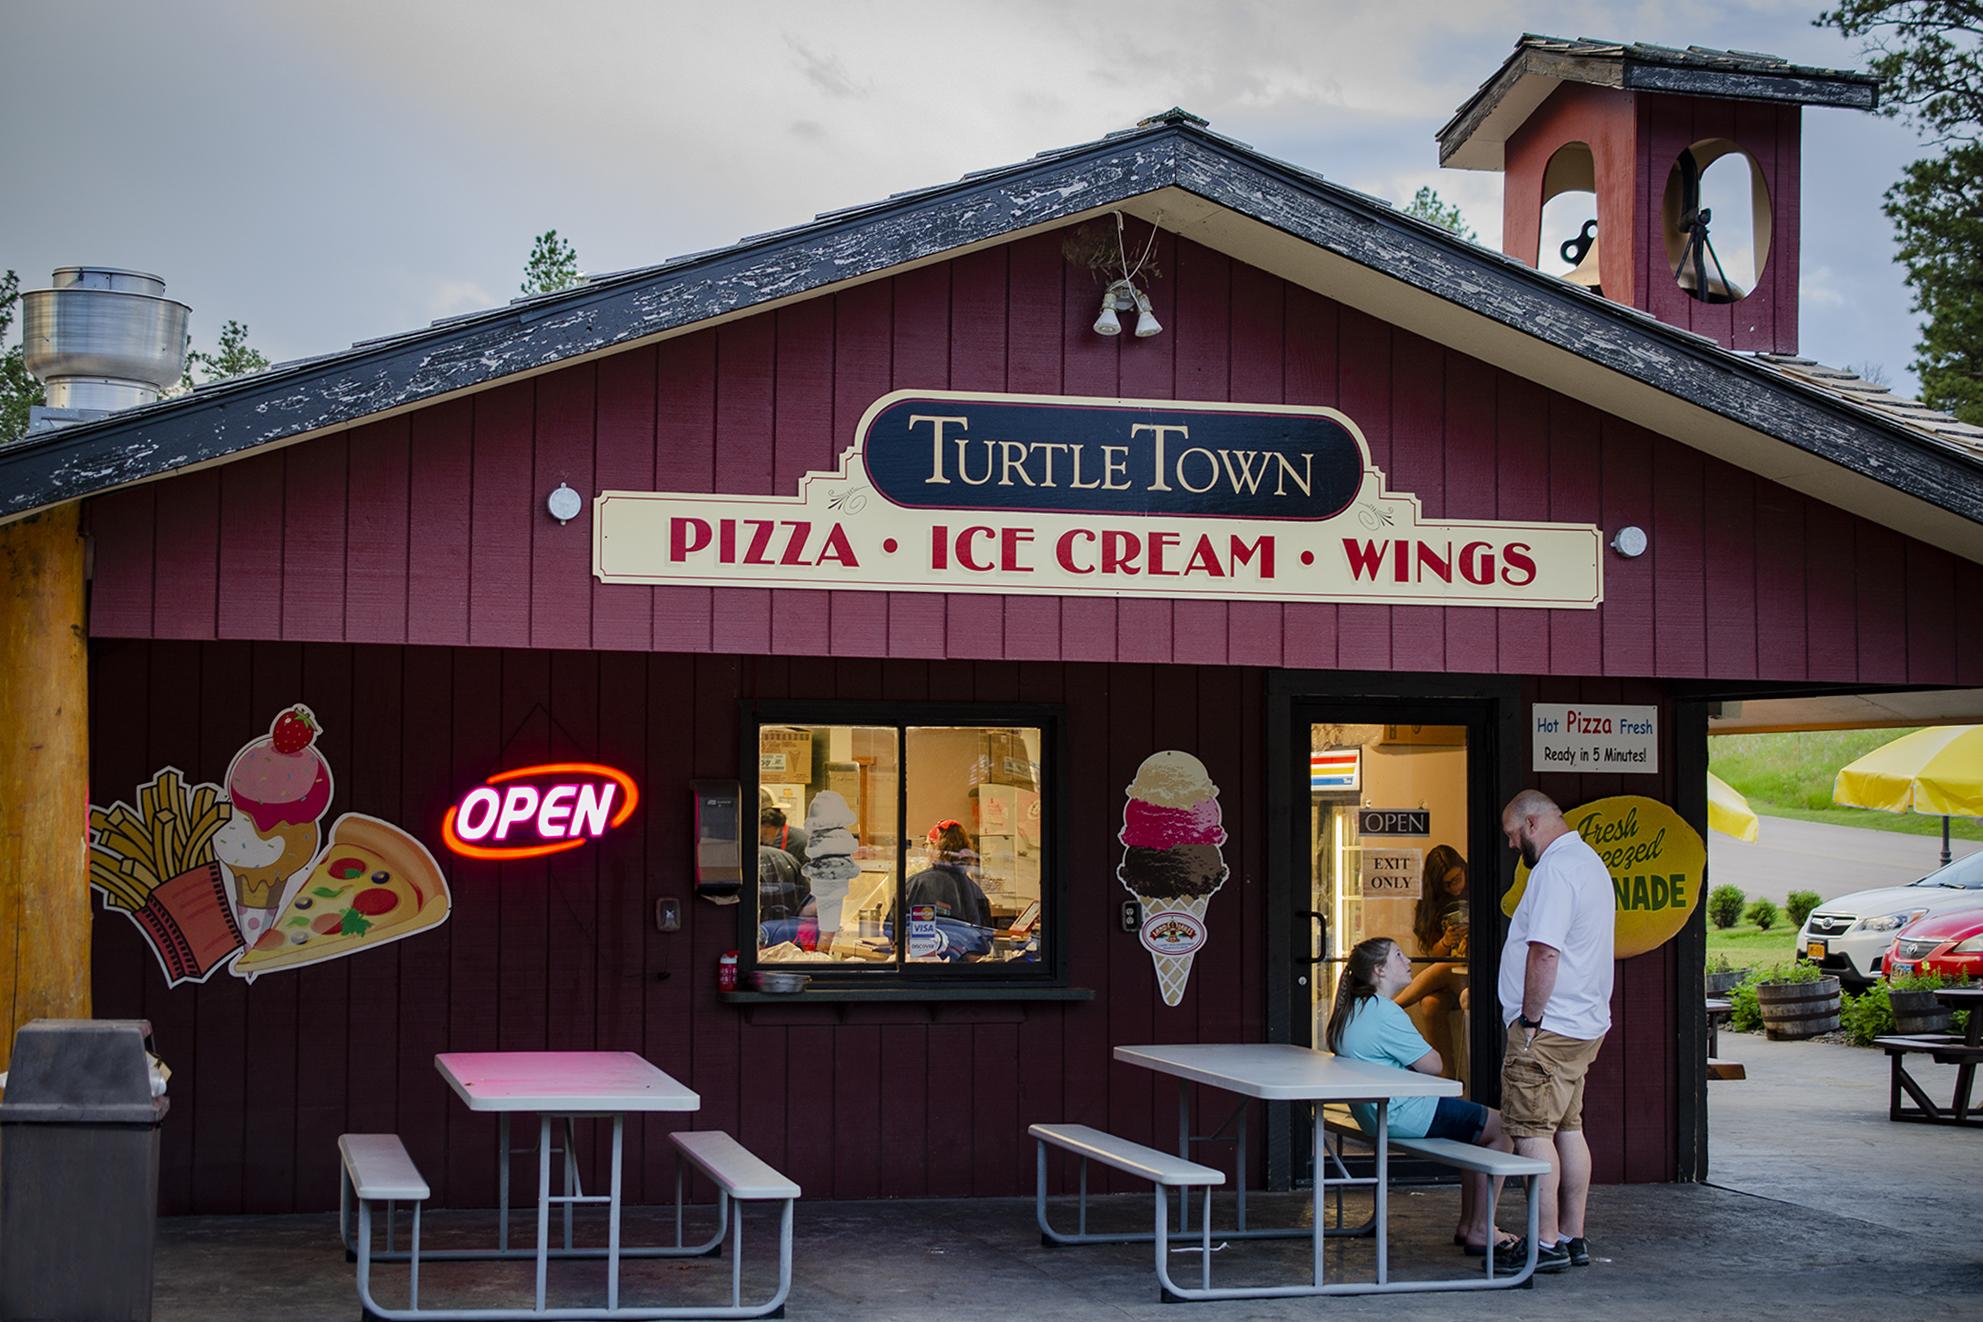 Mount Rushmore KOA Turtle Town Restaurant